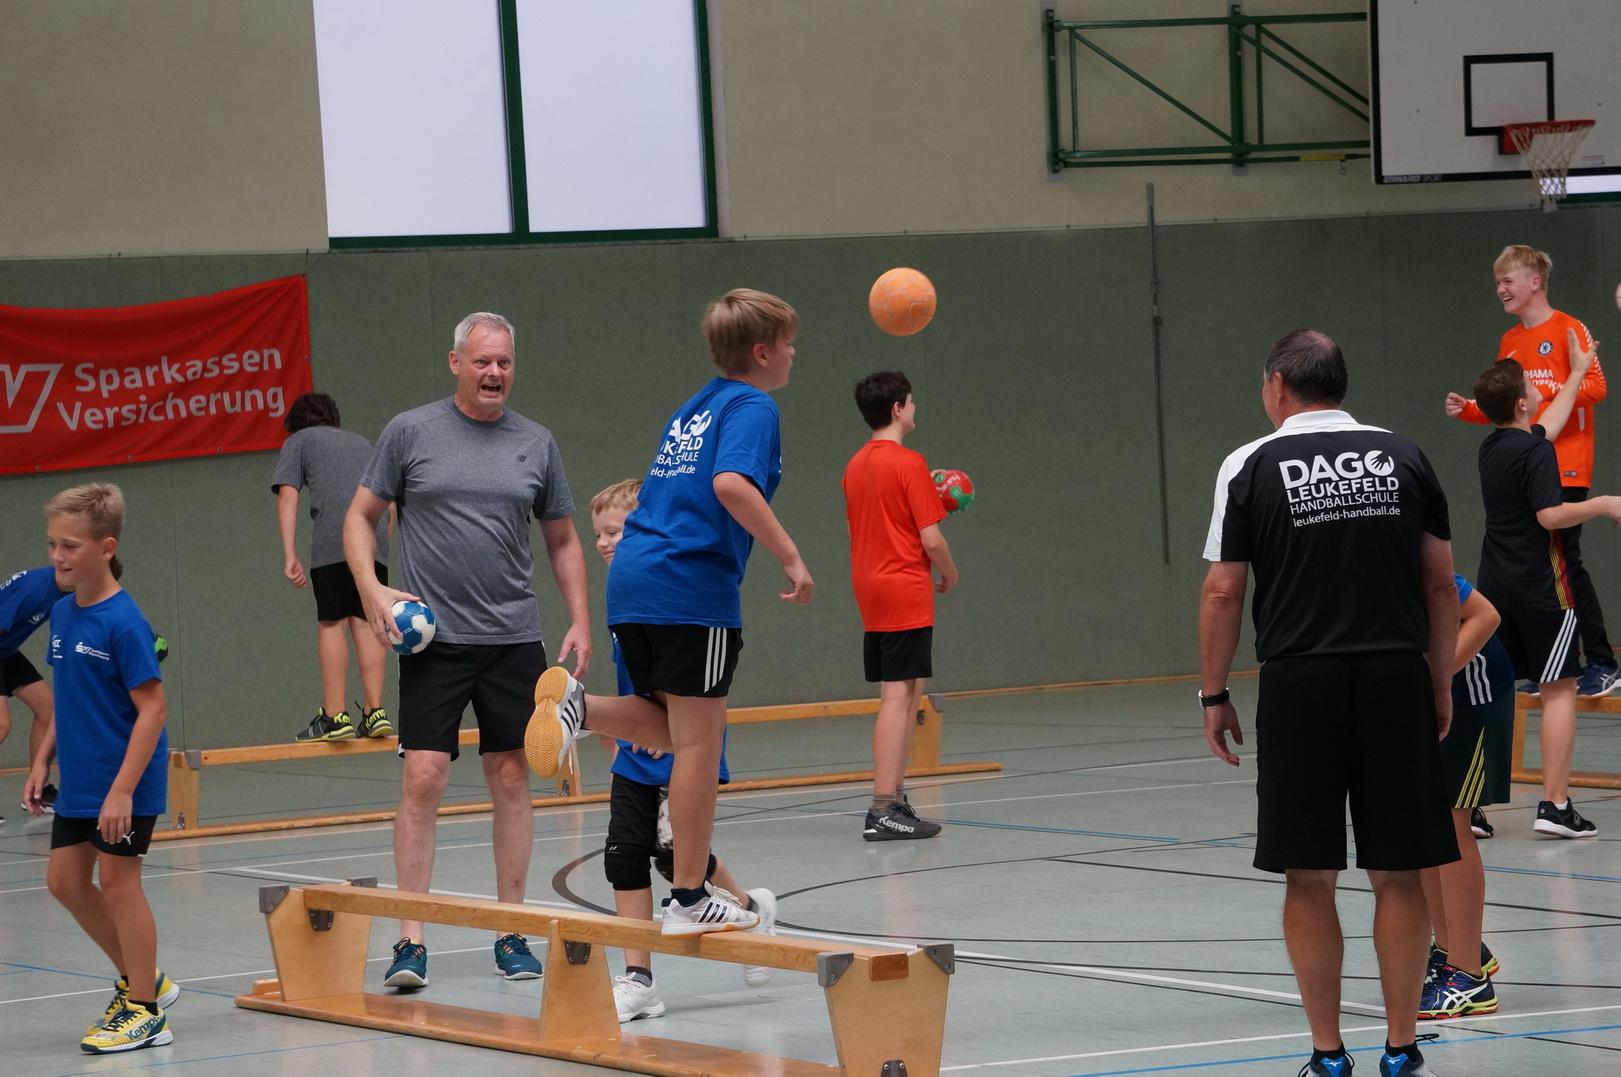 201808_Handballcamp_SDH_MG_179w